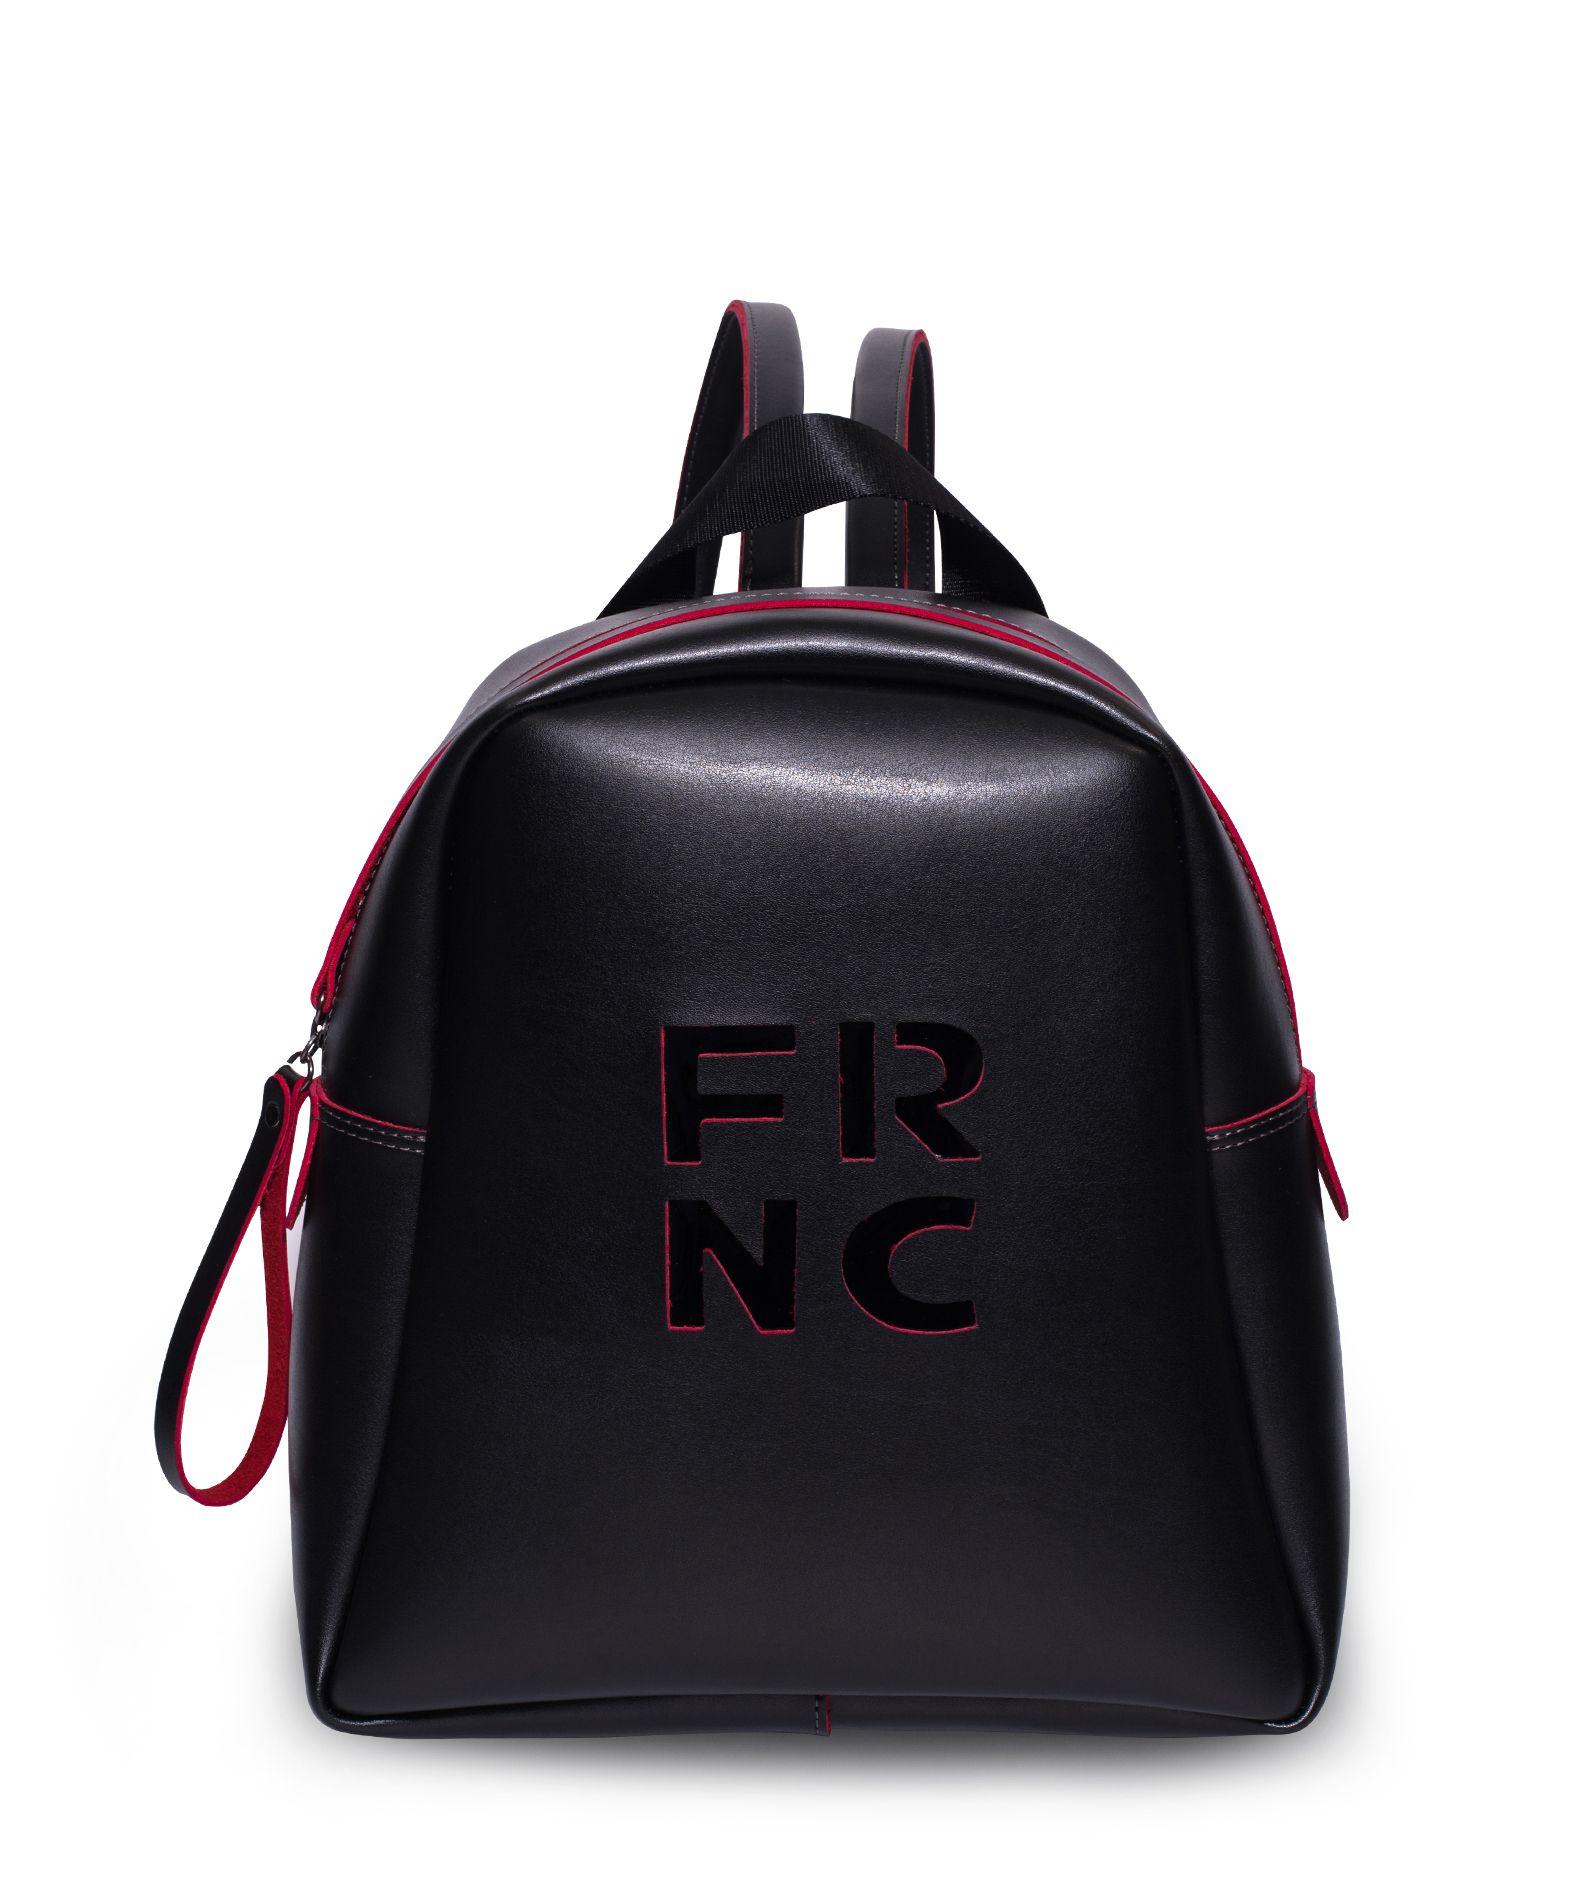 FRNC medium backpack Black | Medium backpack, Bags, Gym bag